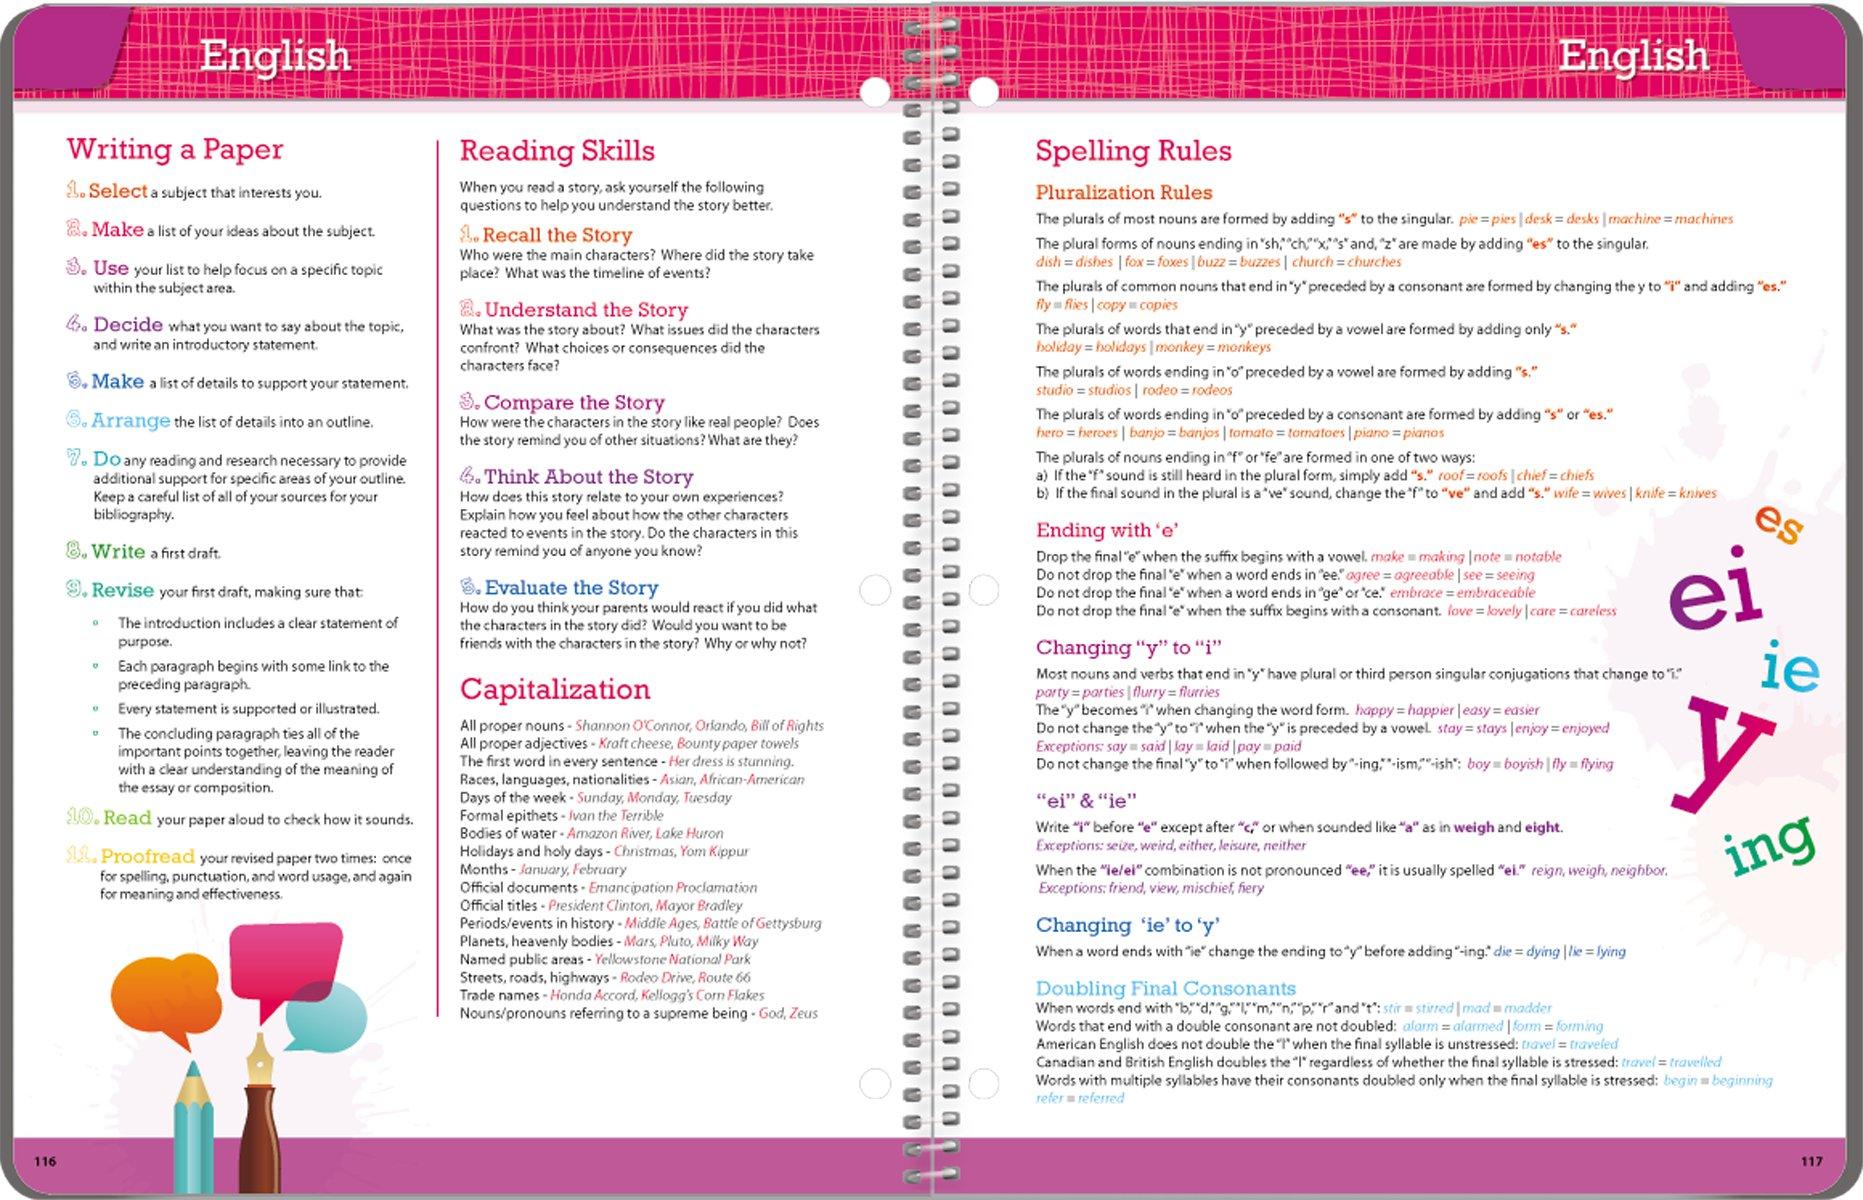 Student Planner 2016 - 2017 School Year Planner Elementary School Content 8.5'' x 11'' by School Datebooks (Image #7)